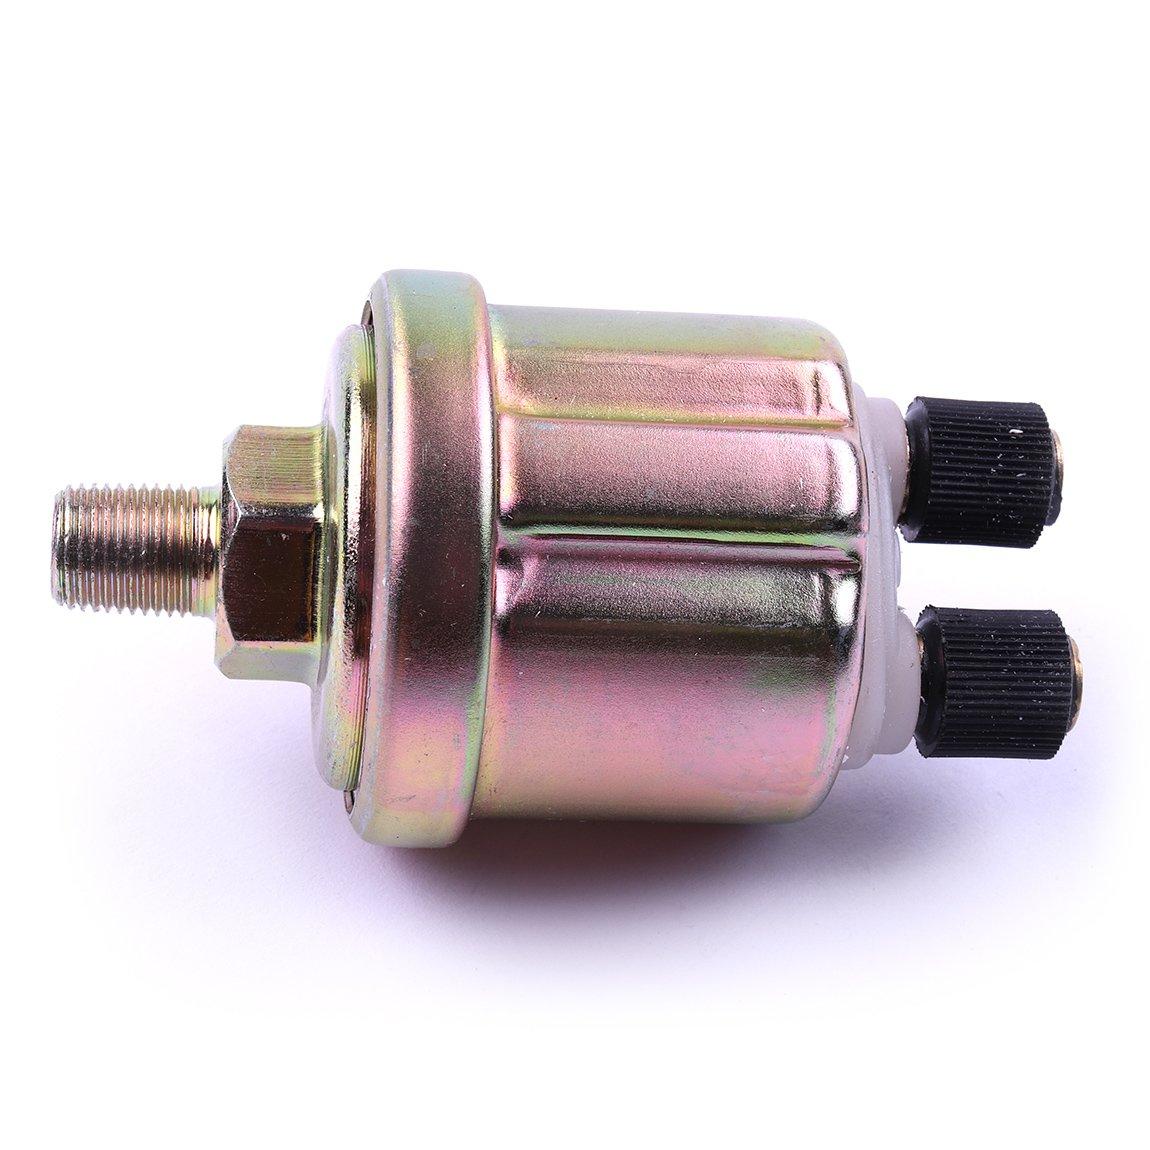 Atoplee 1pcs Oil Pressure Sensor Oil Pressure